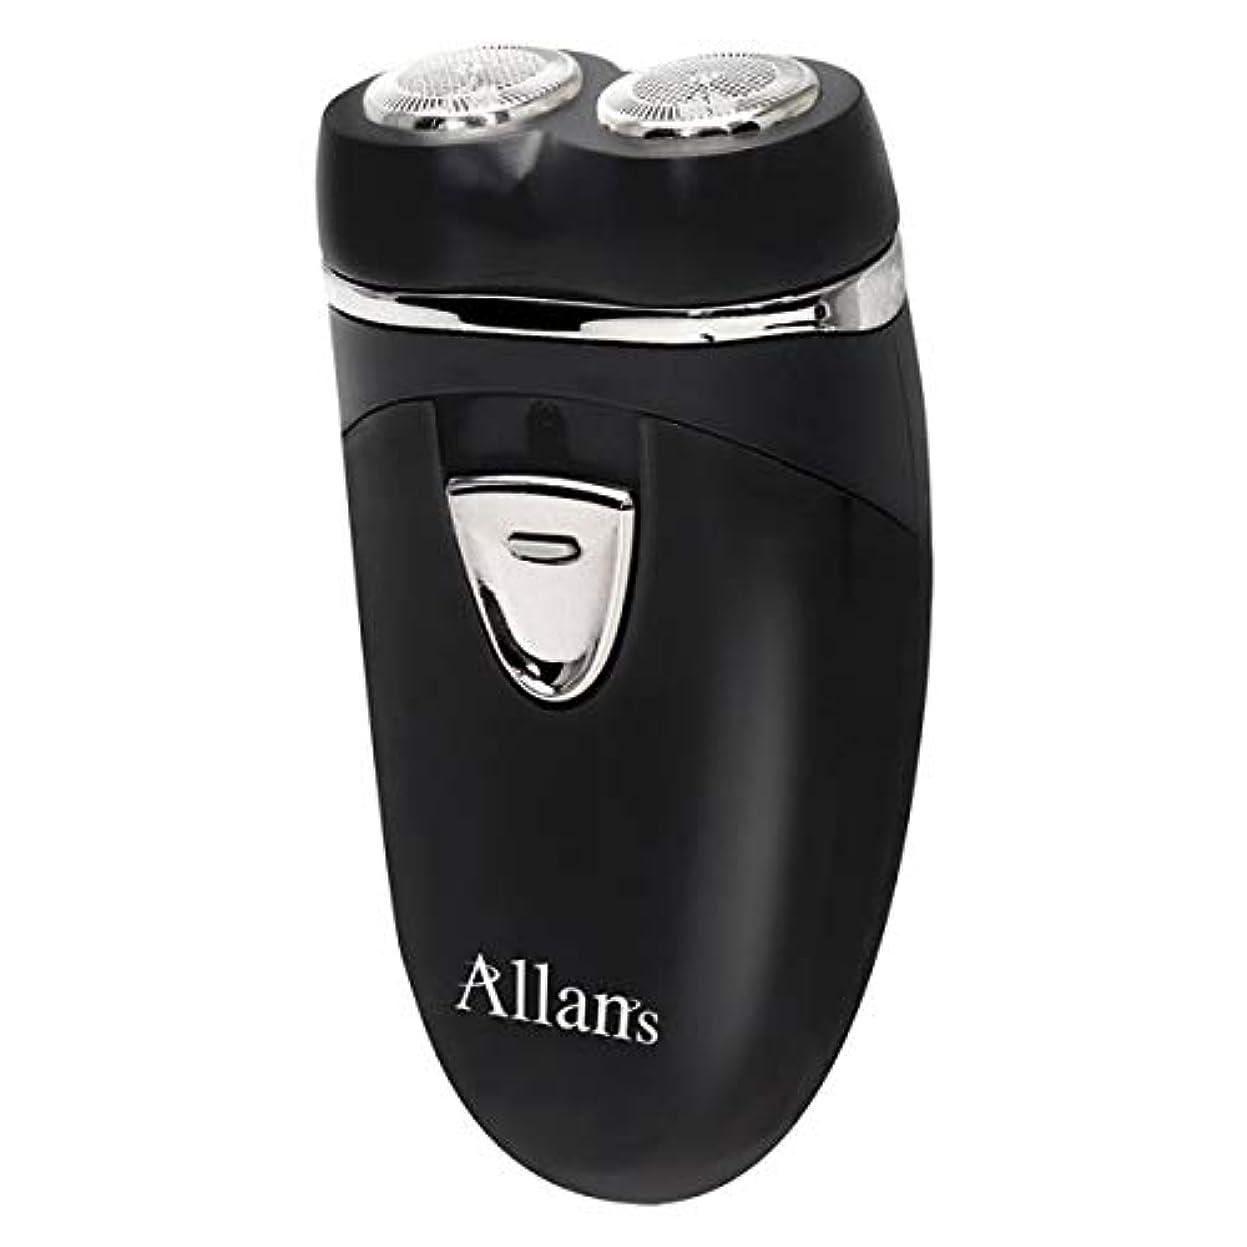 Allans ライト付き コンパクト ツイン メンズ シェーバー MEBM-42